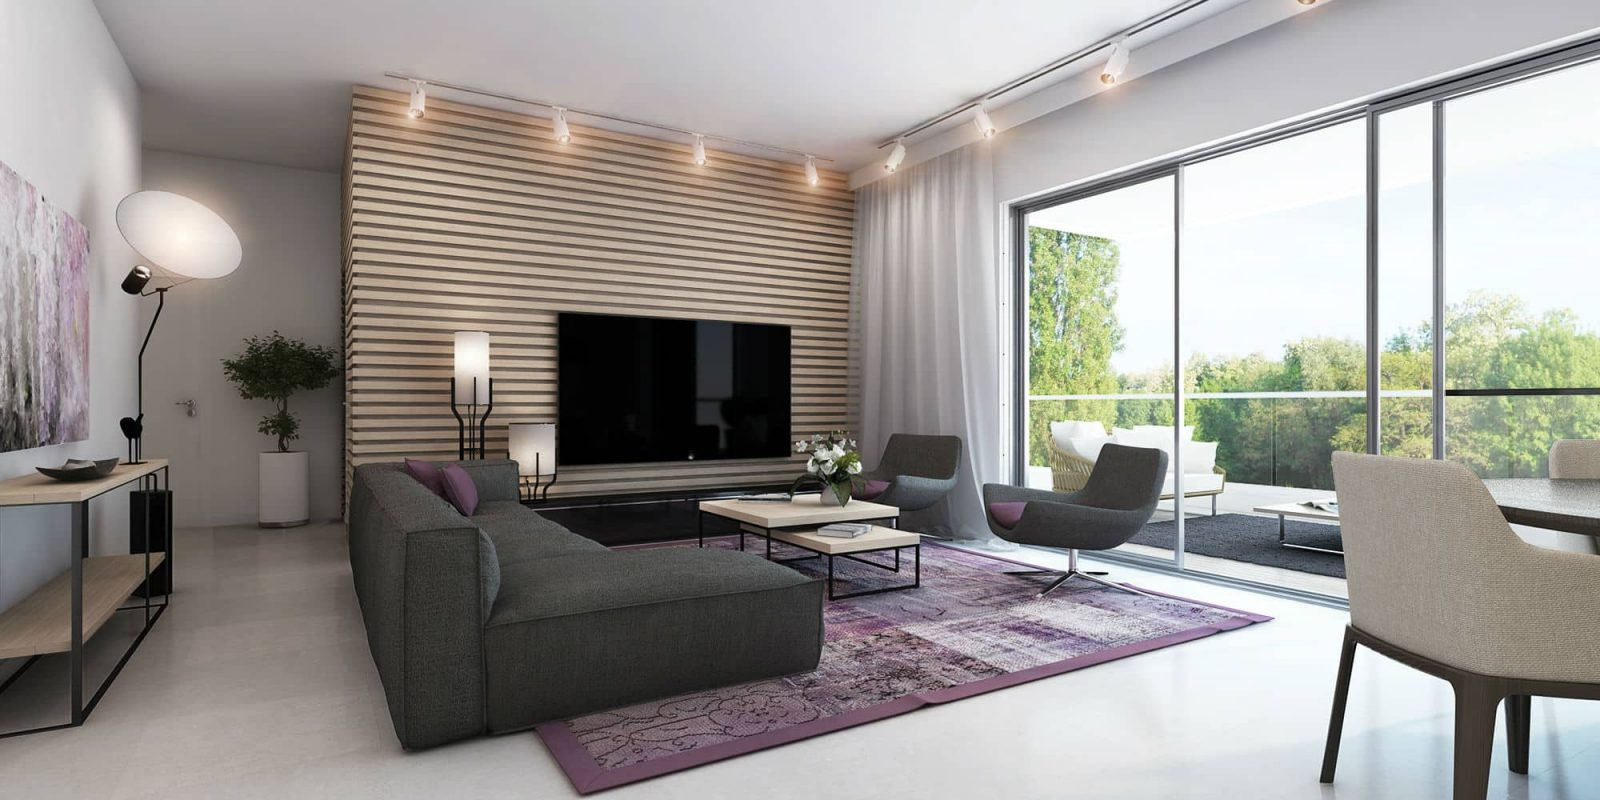 Web3D - הדמיות אדריכליות - אילוסטרציה של סלון בבית